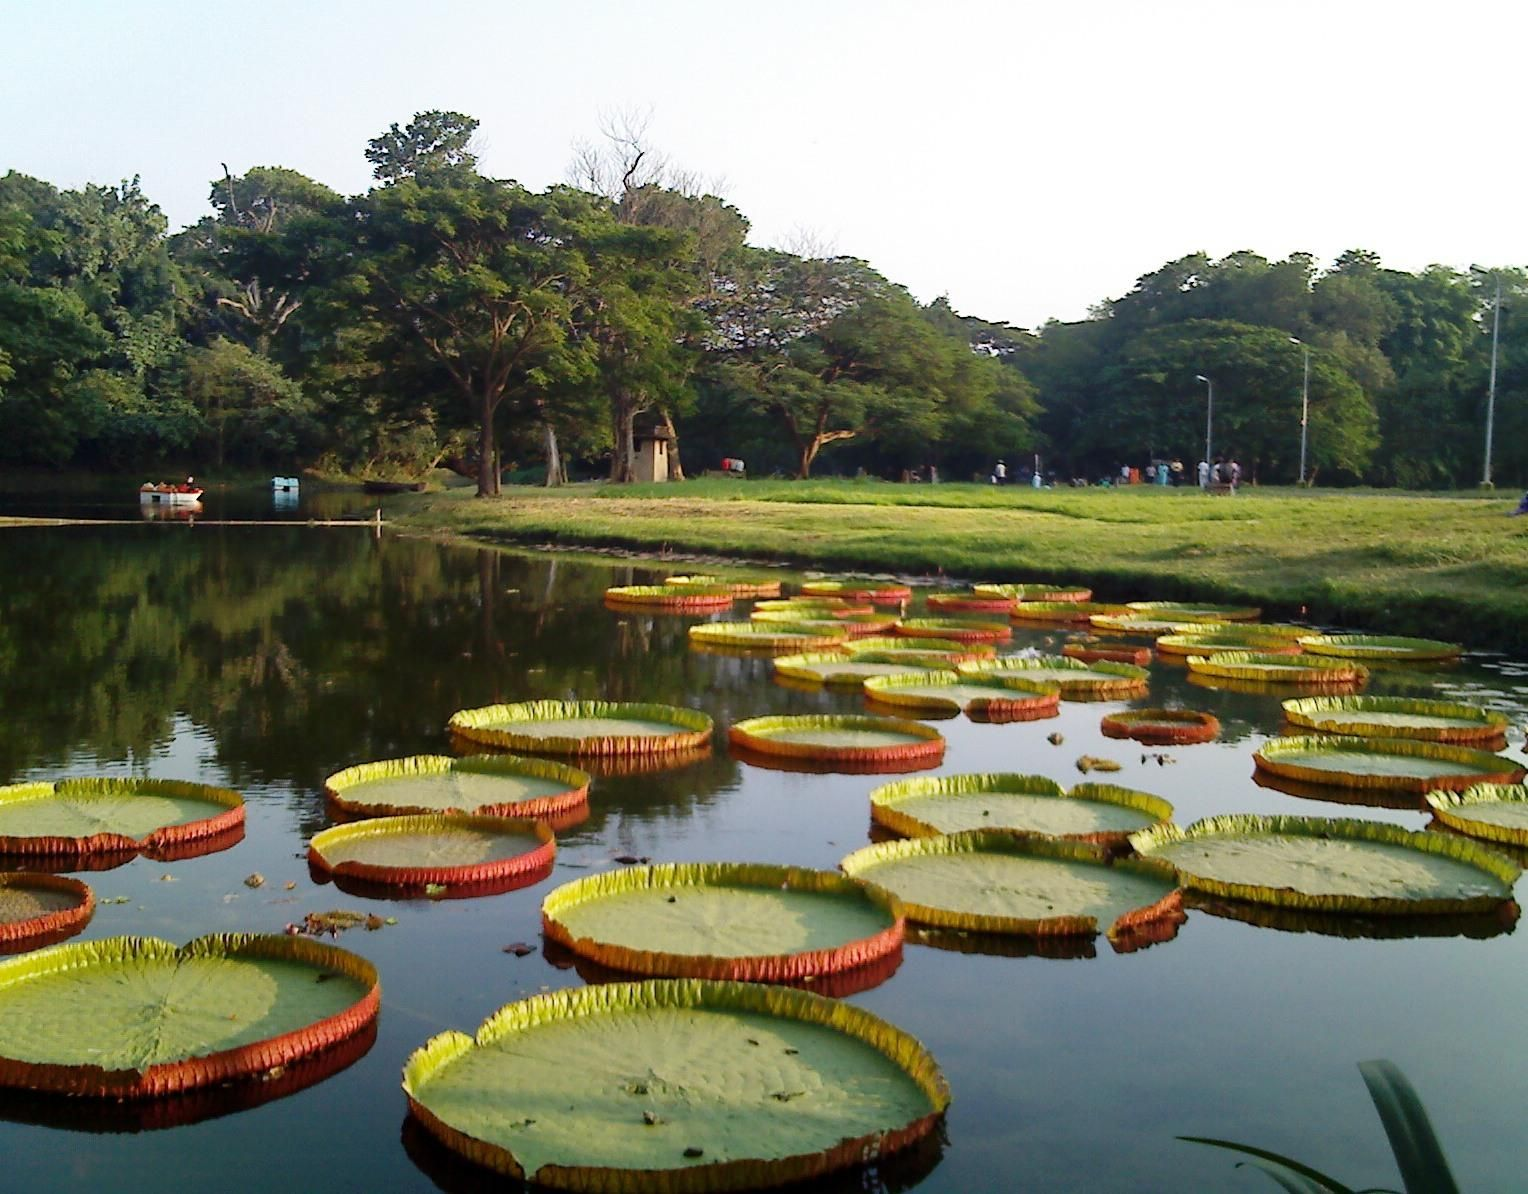 kolkata Google Search Botanical gardens, Garden images